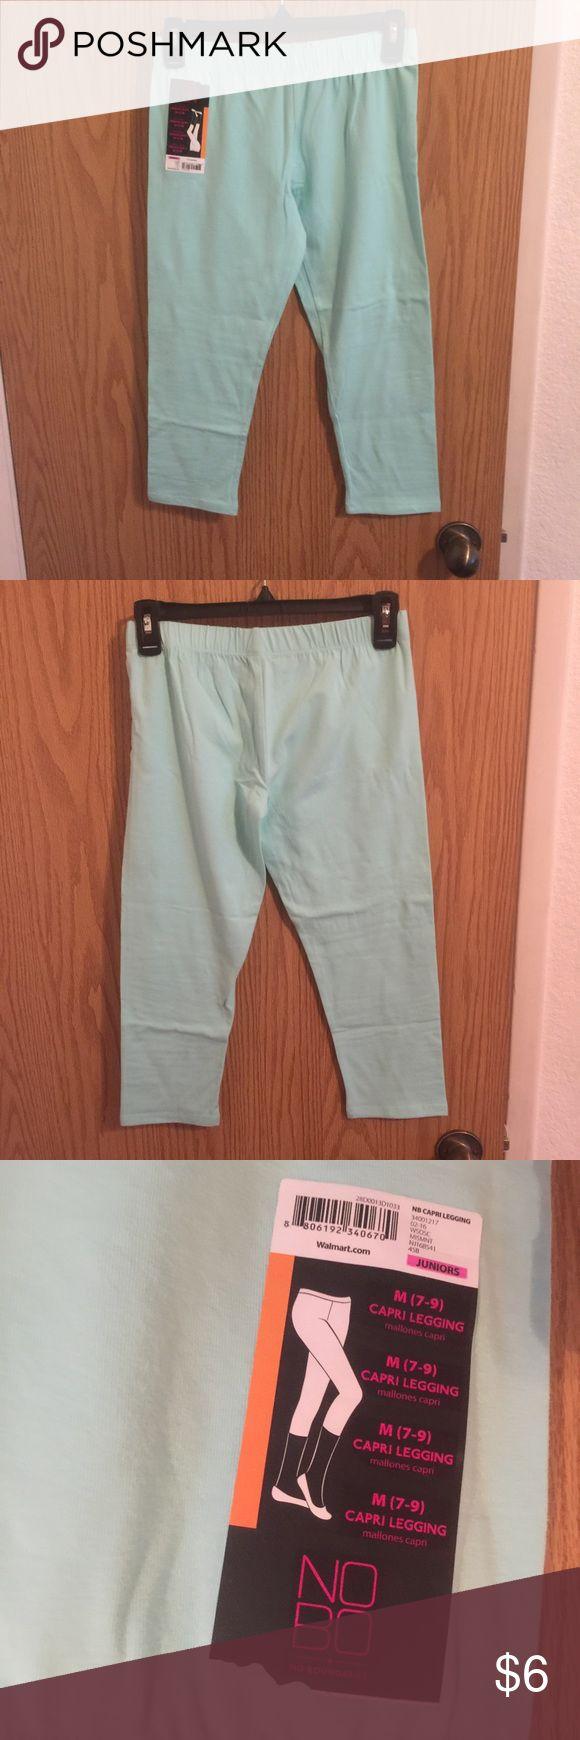 Mint Capri Leggings No flaws, mint color No Boundaries Pants Leggings